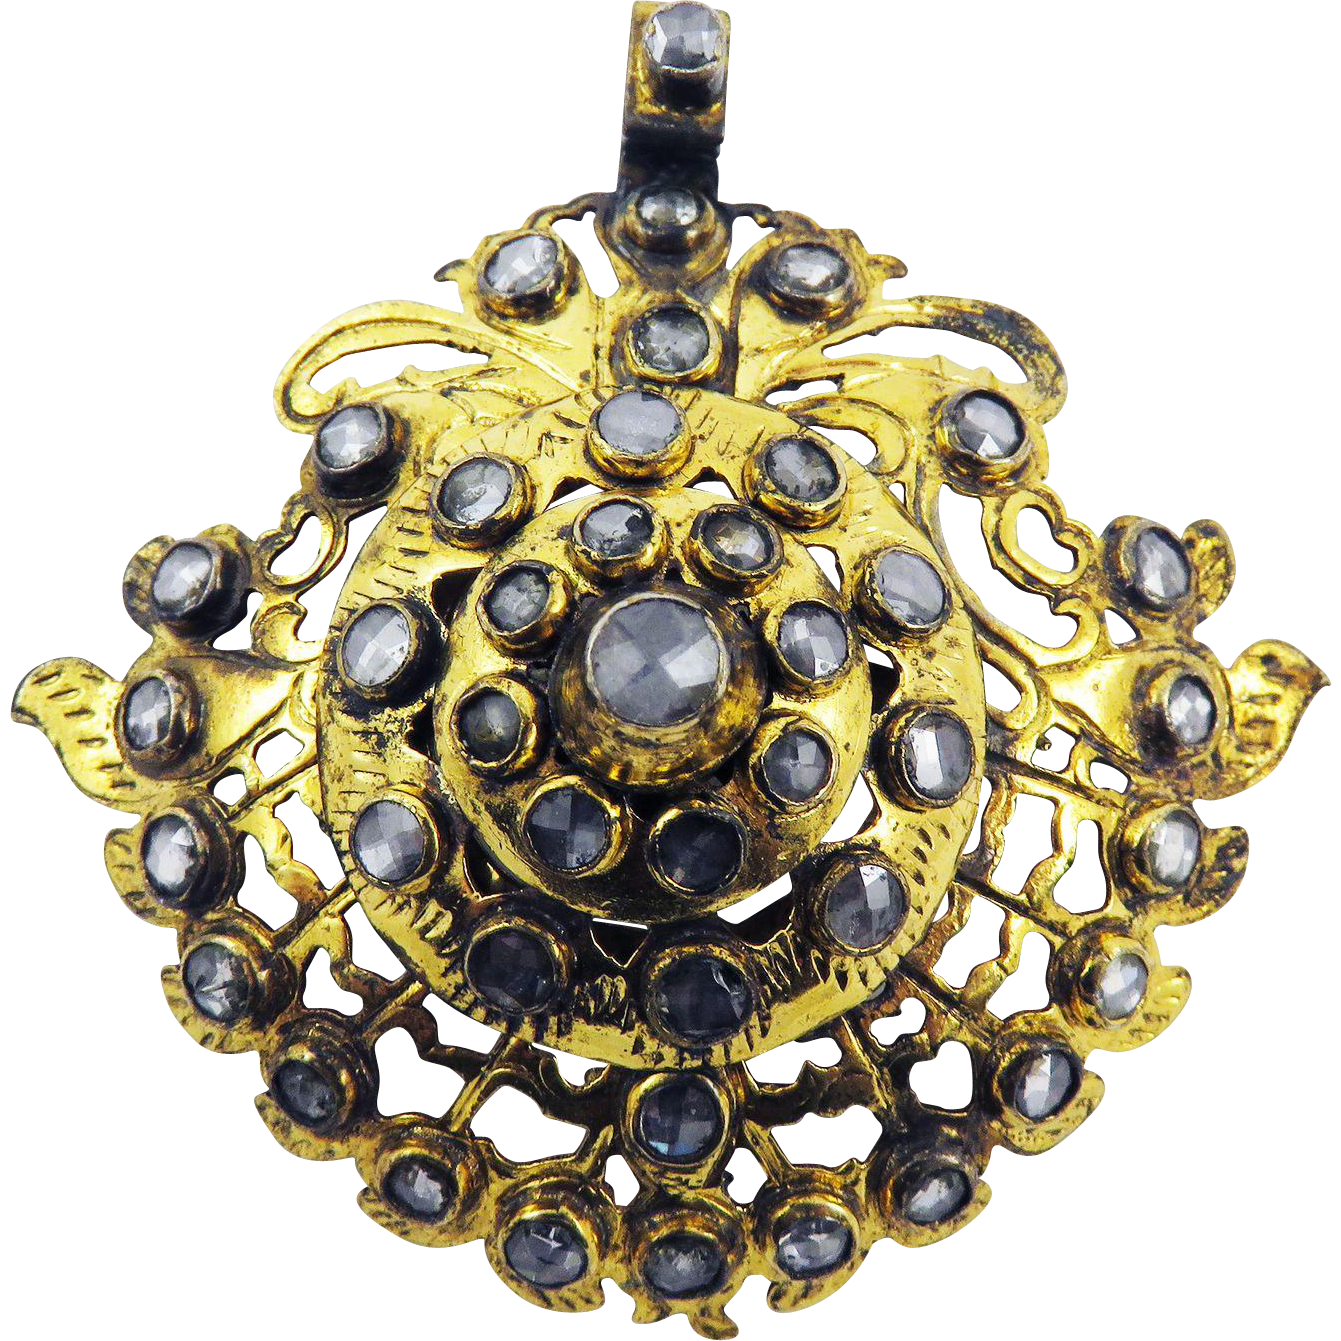 SHIMMERING 2.6 Ct. TW Large Indian Rose-Cut Diamond/8k Pendant, c.1870!